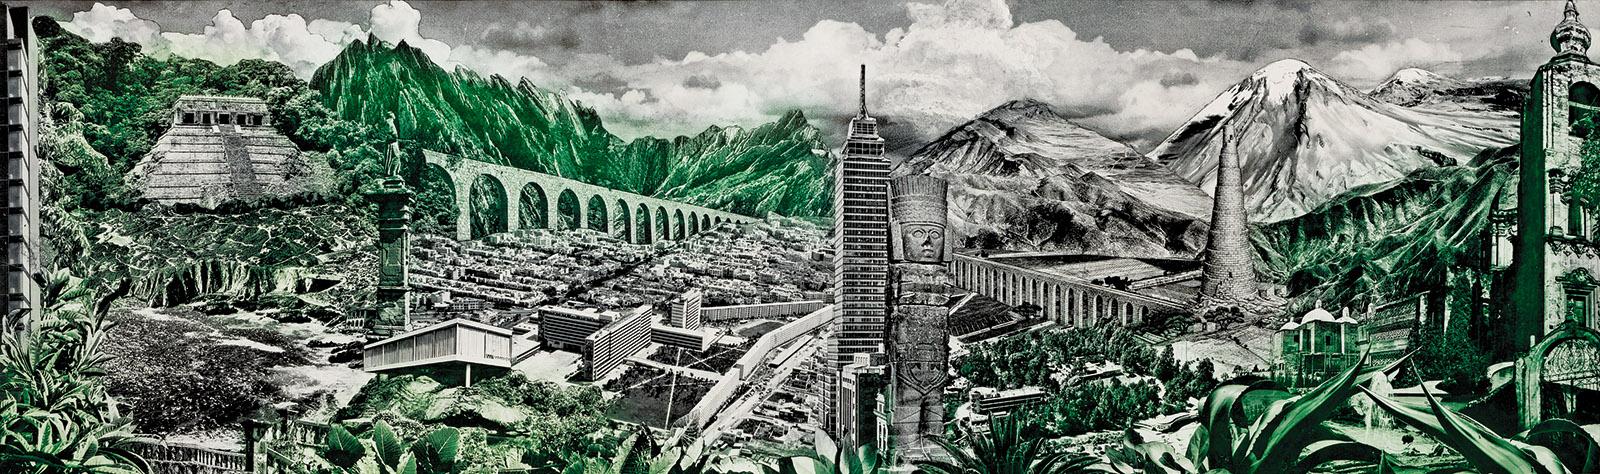 Lola Álvarez Bravo: Landscapes of Mexico, circa 1954